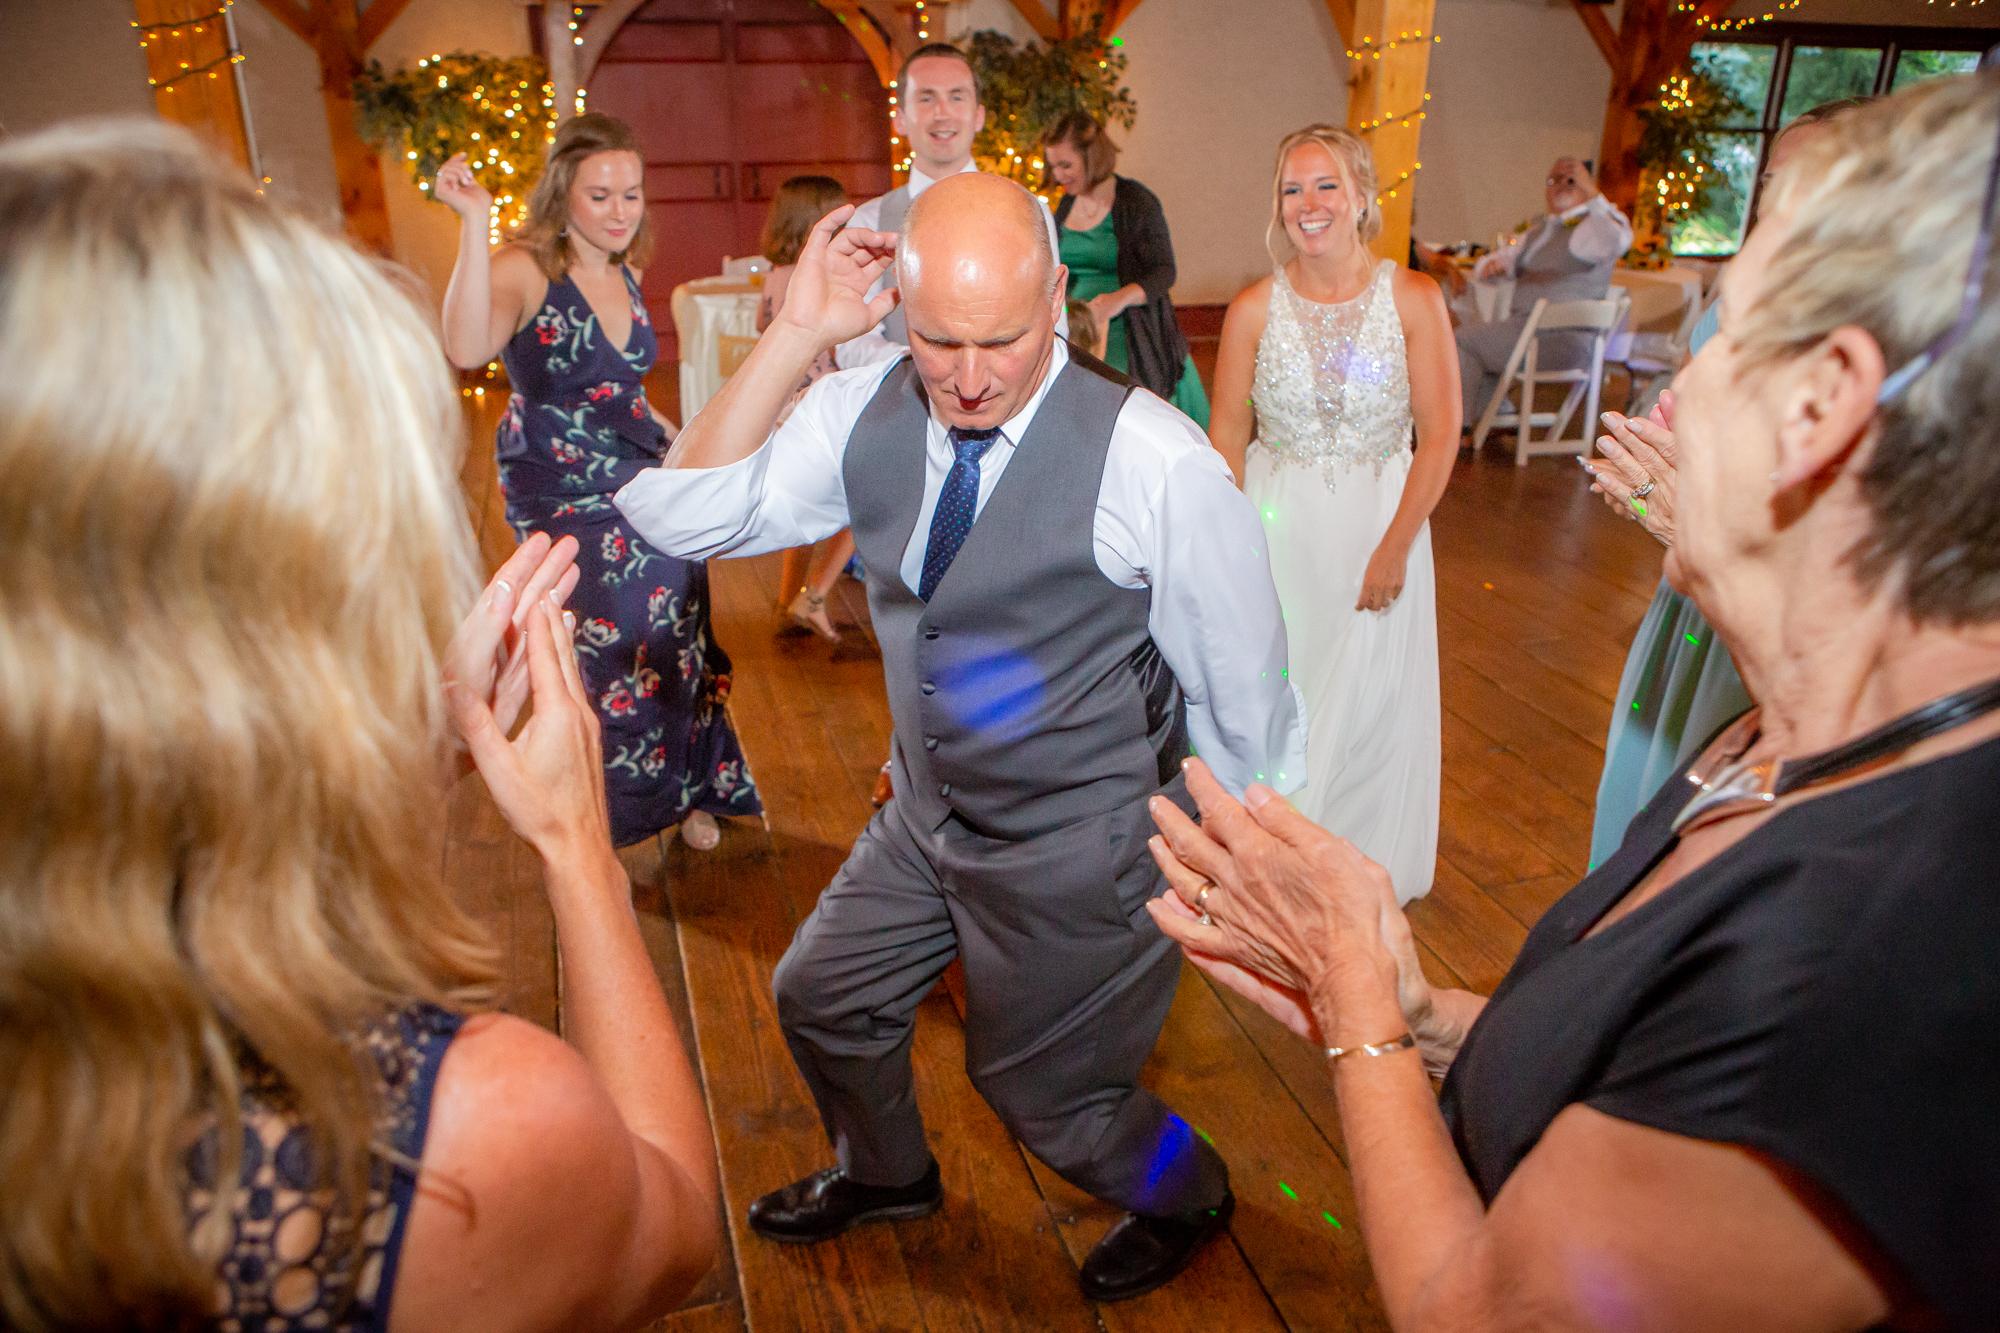 Wedding-Carriage-House-Oneonta-NY-1074.jpg